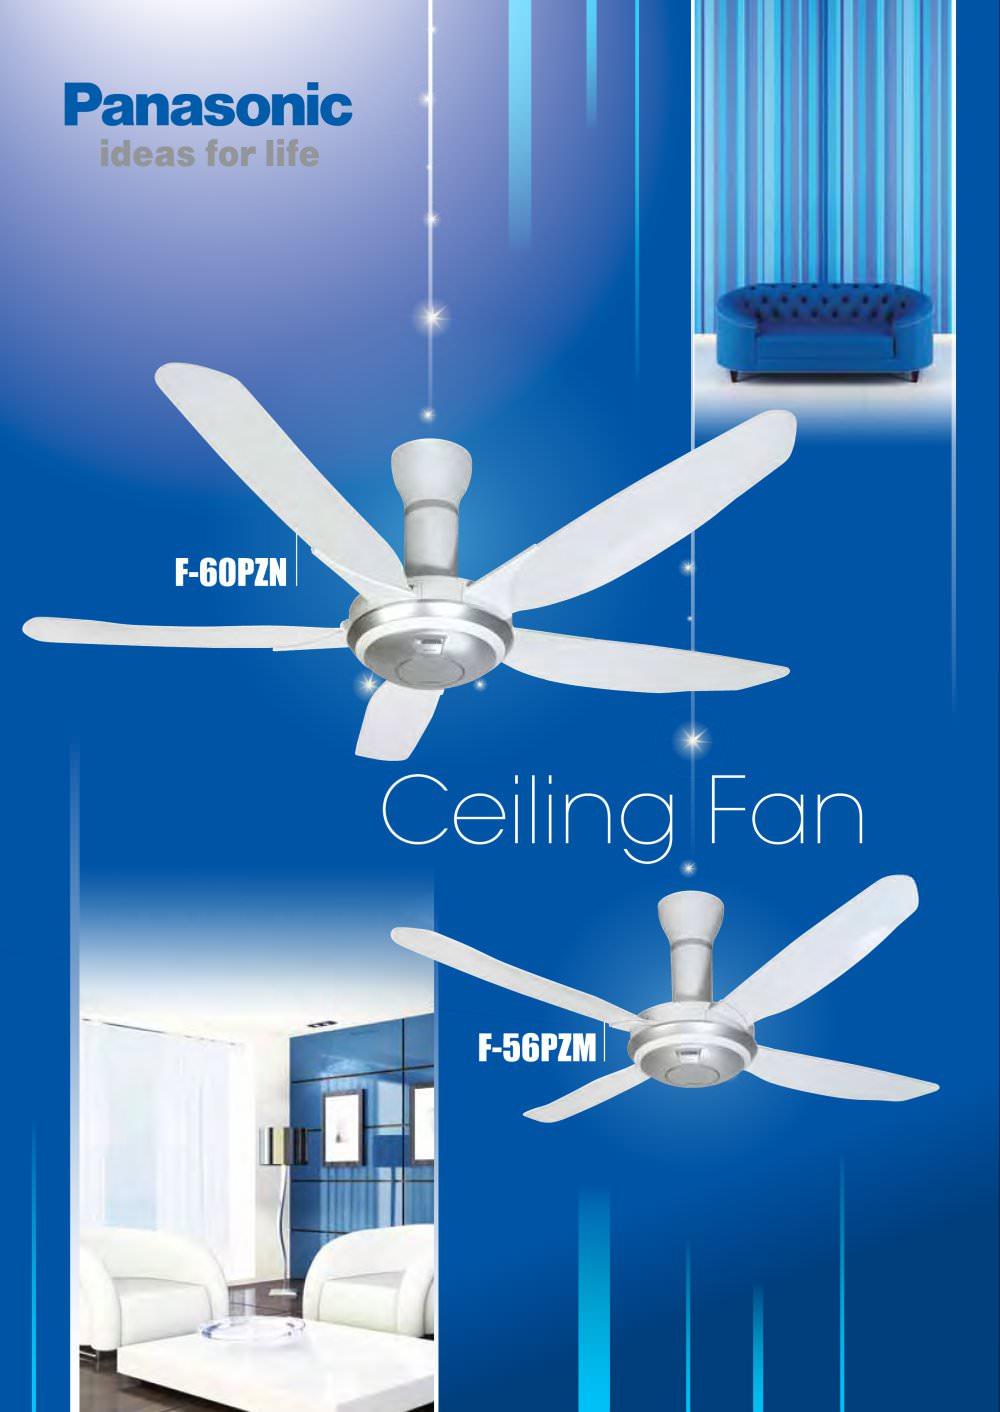 Ceiling fan panasonic home appliances pdf catalogues ceiling fan 1 16 pages mozeypictures Gallery